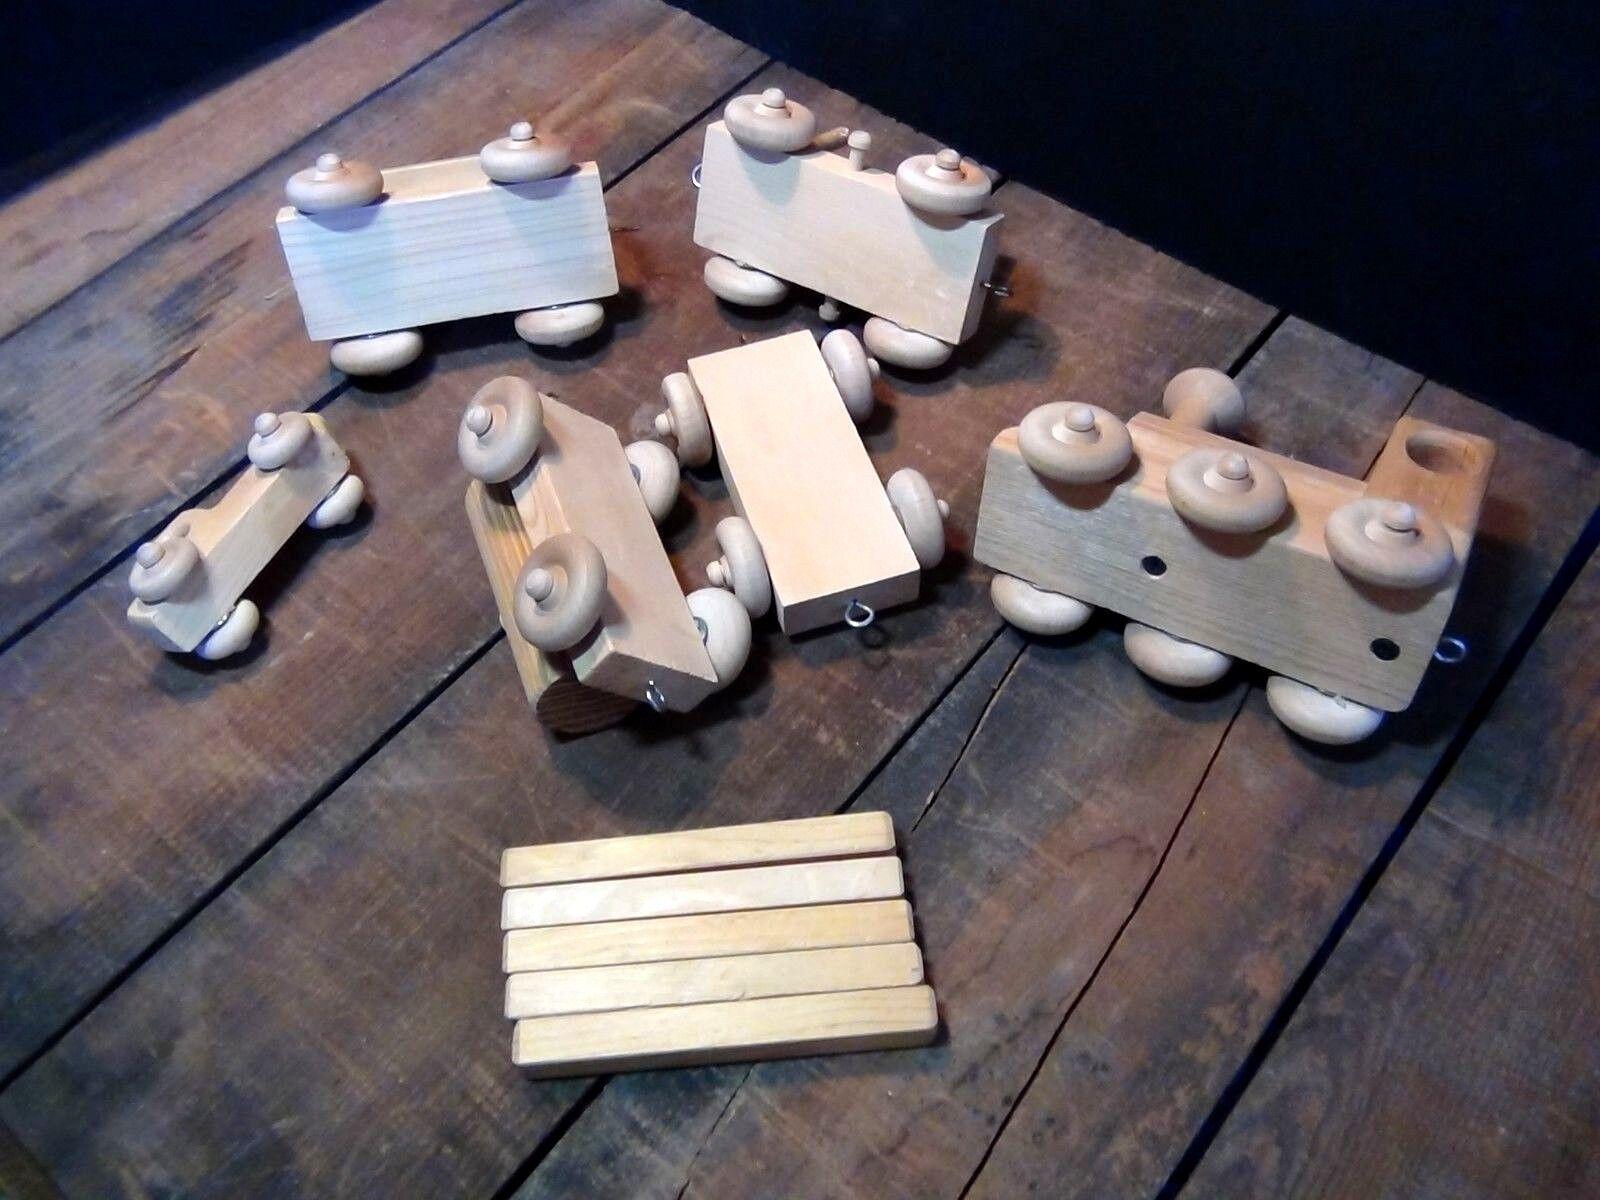 Handmade Wooden Mini Train Set  11 11 11 pieces Total Length 28  1bc361